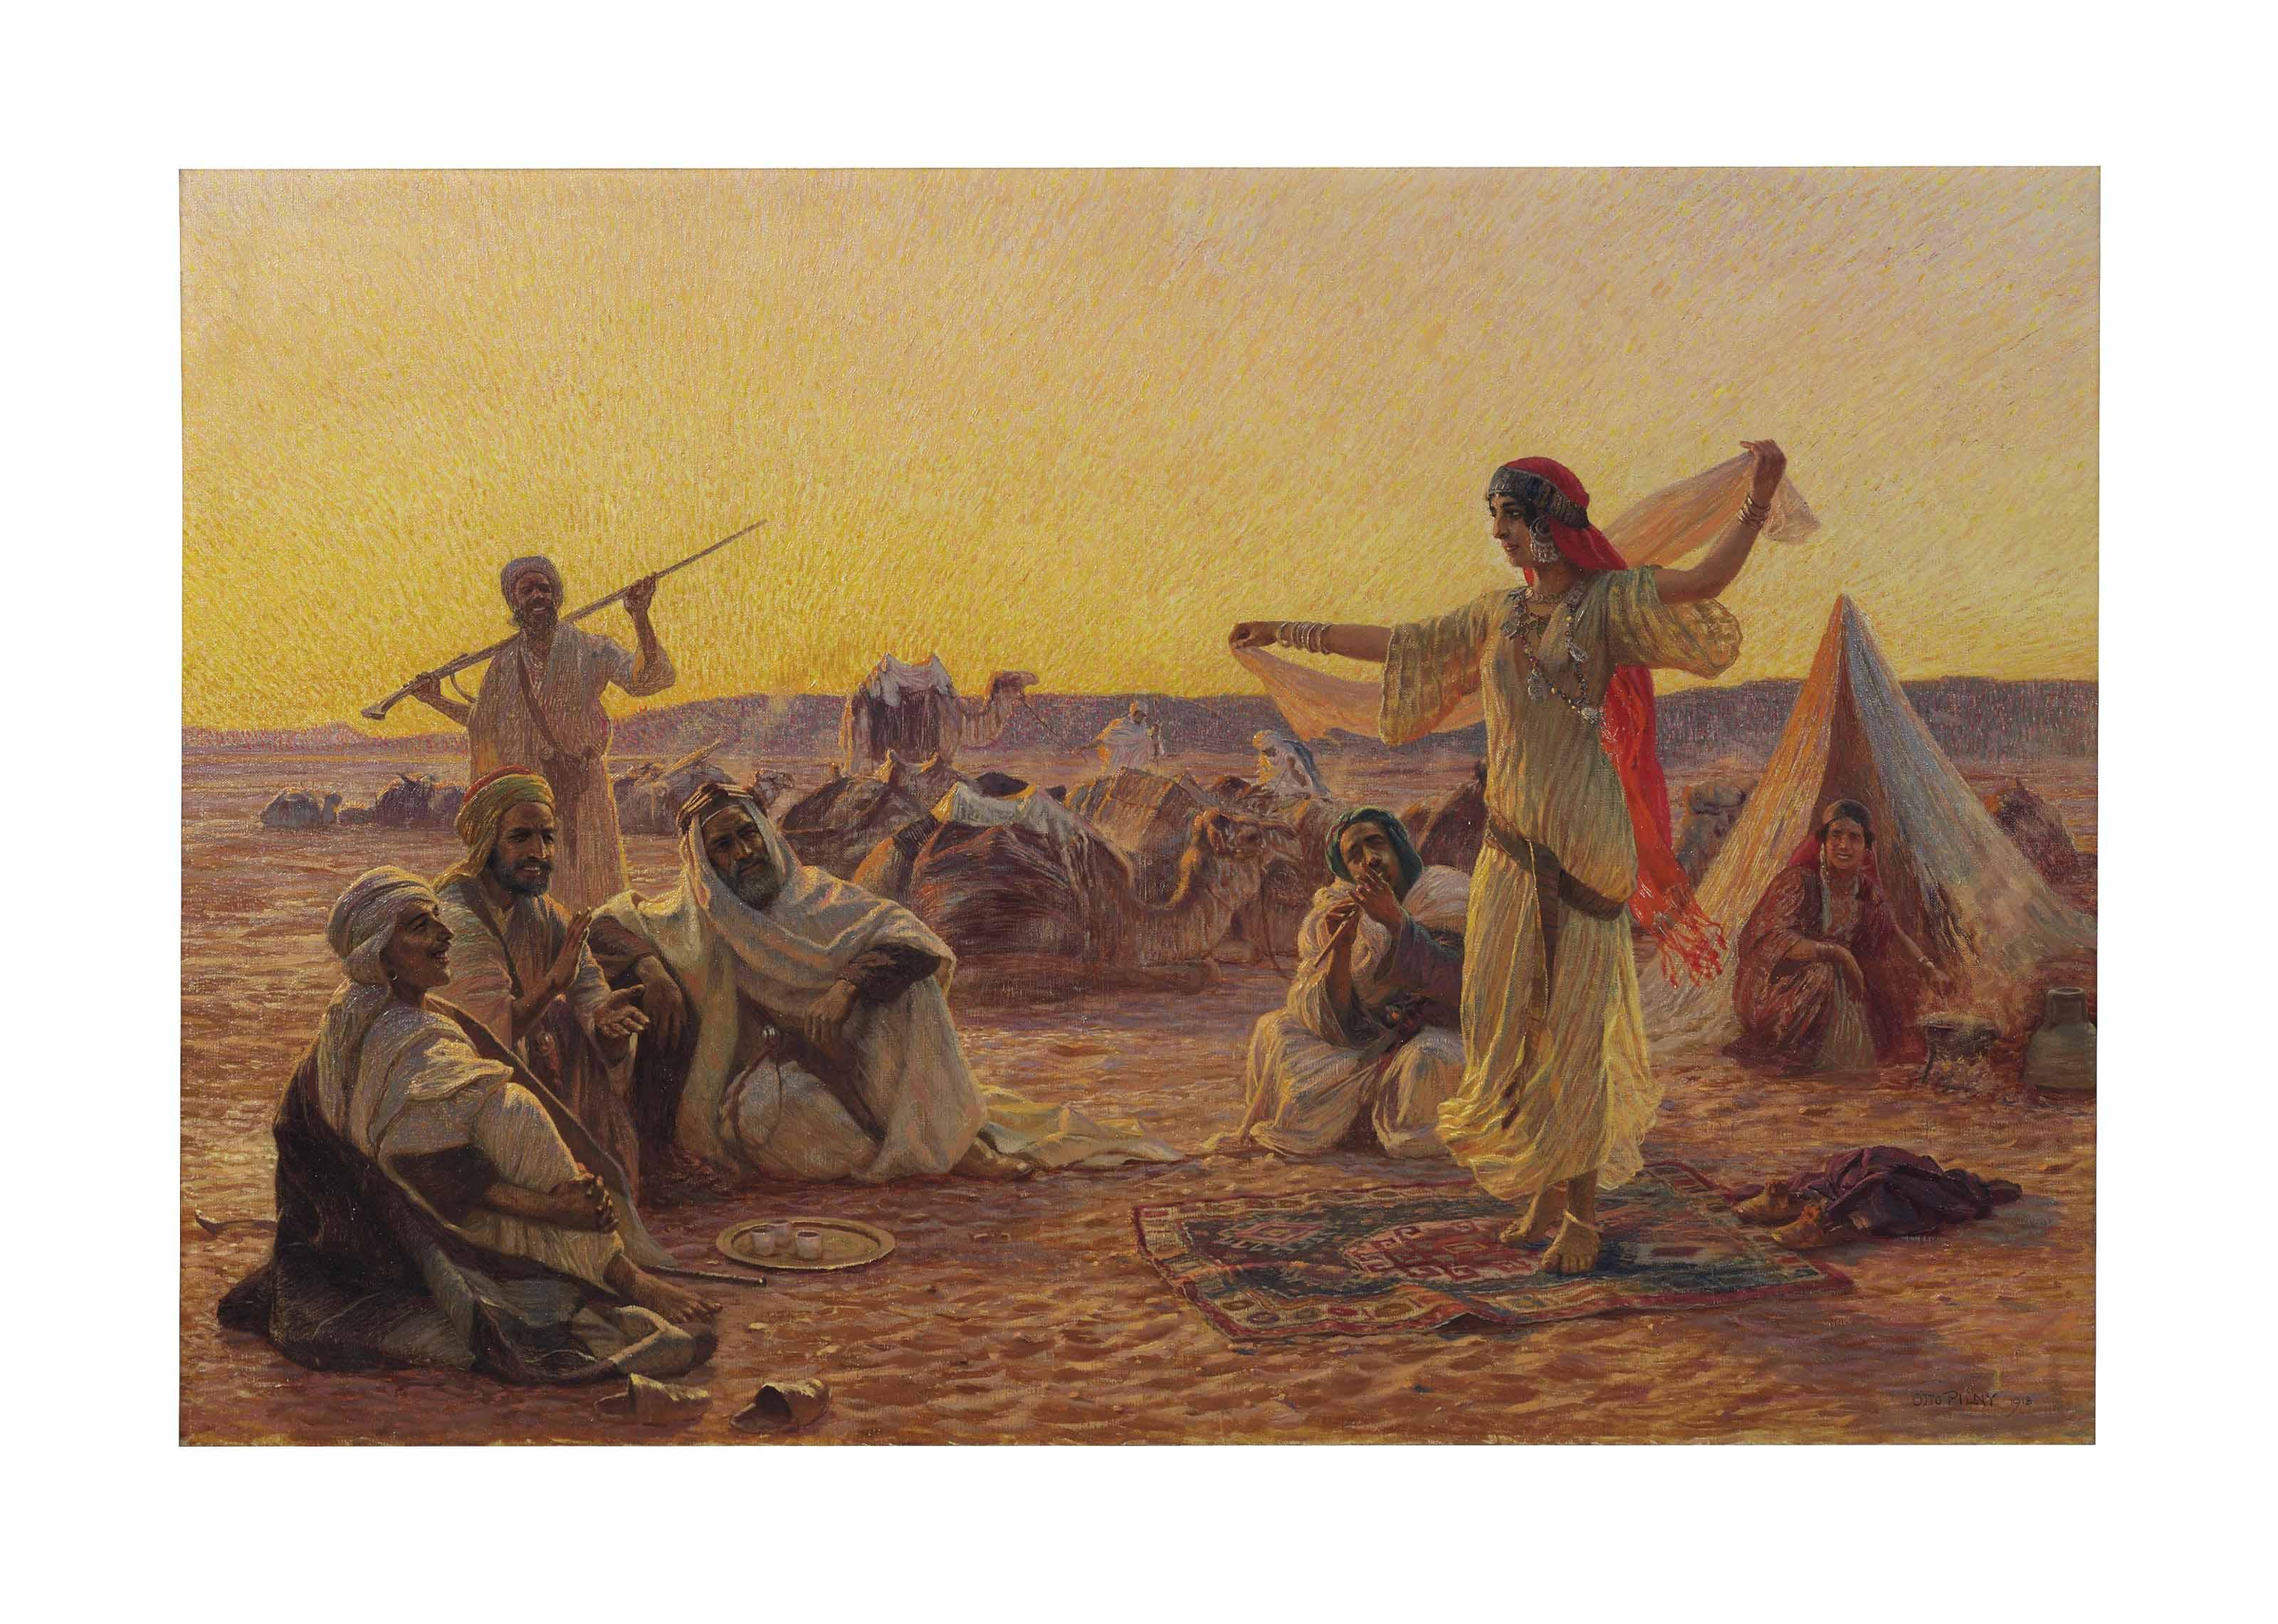 A dance in the desert